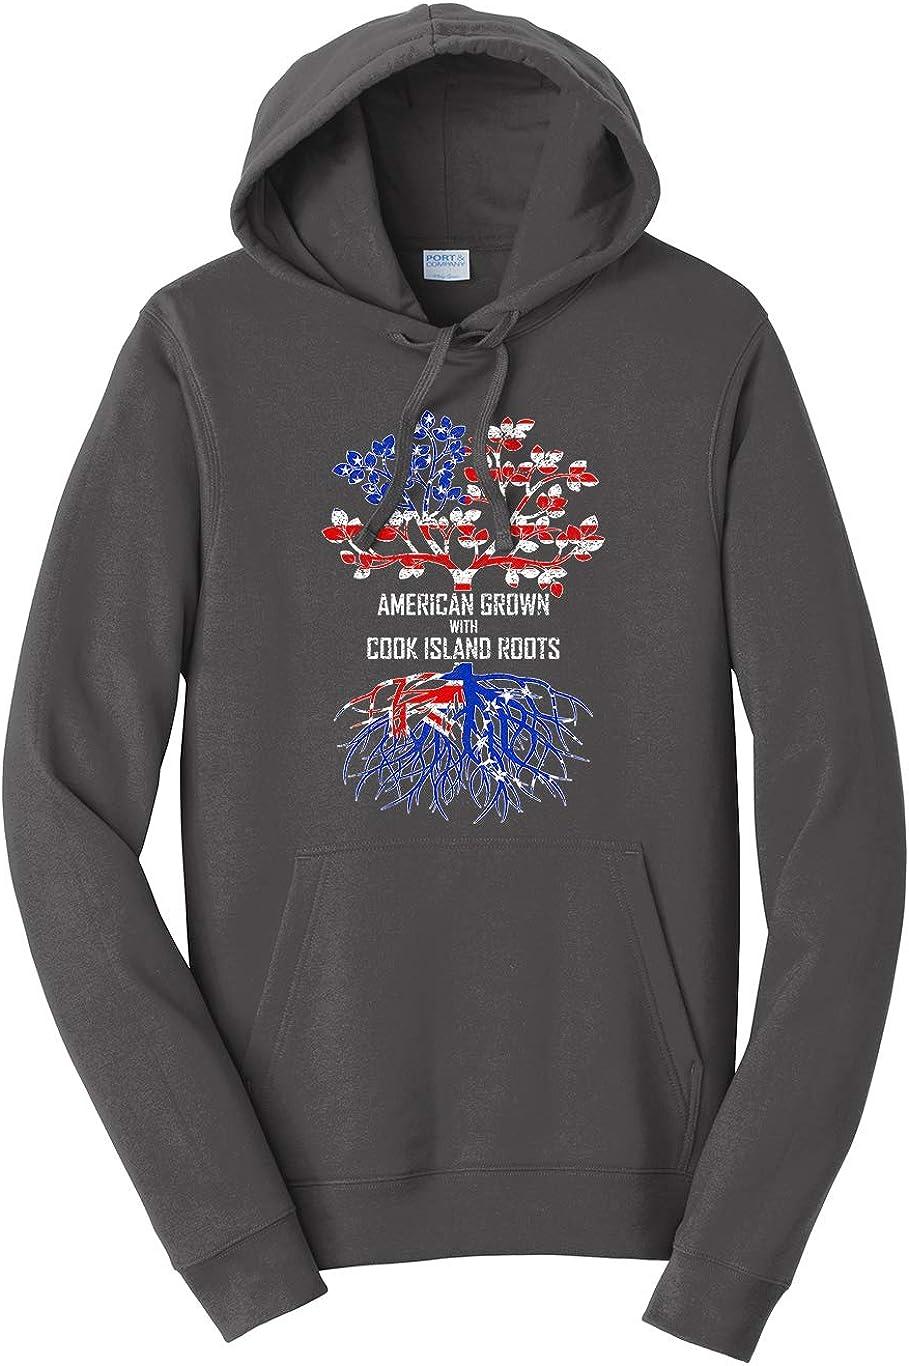 Tenacitee Unisex American Grown with Cook Island Roots Hooded Sweatshirt